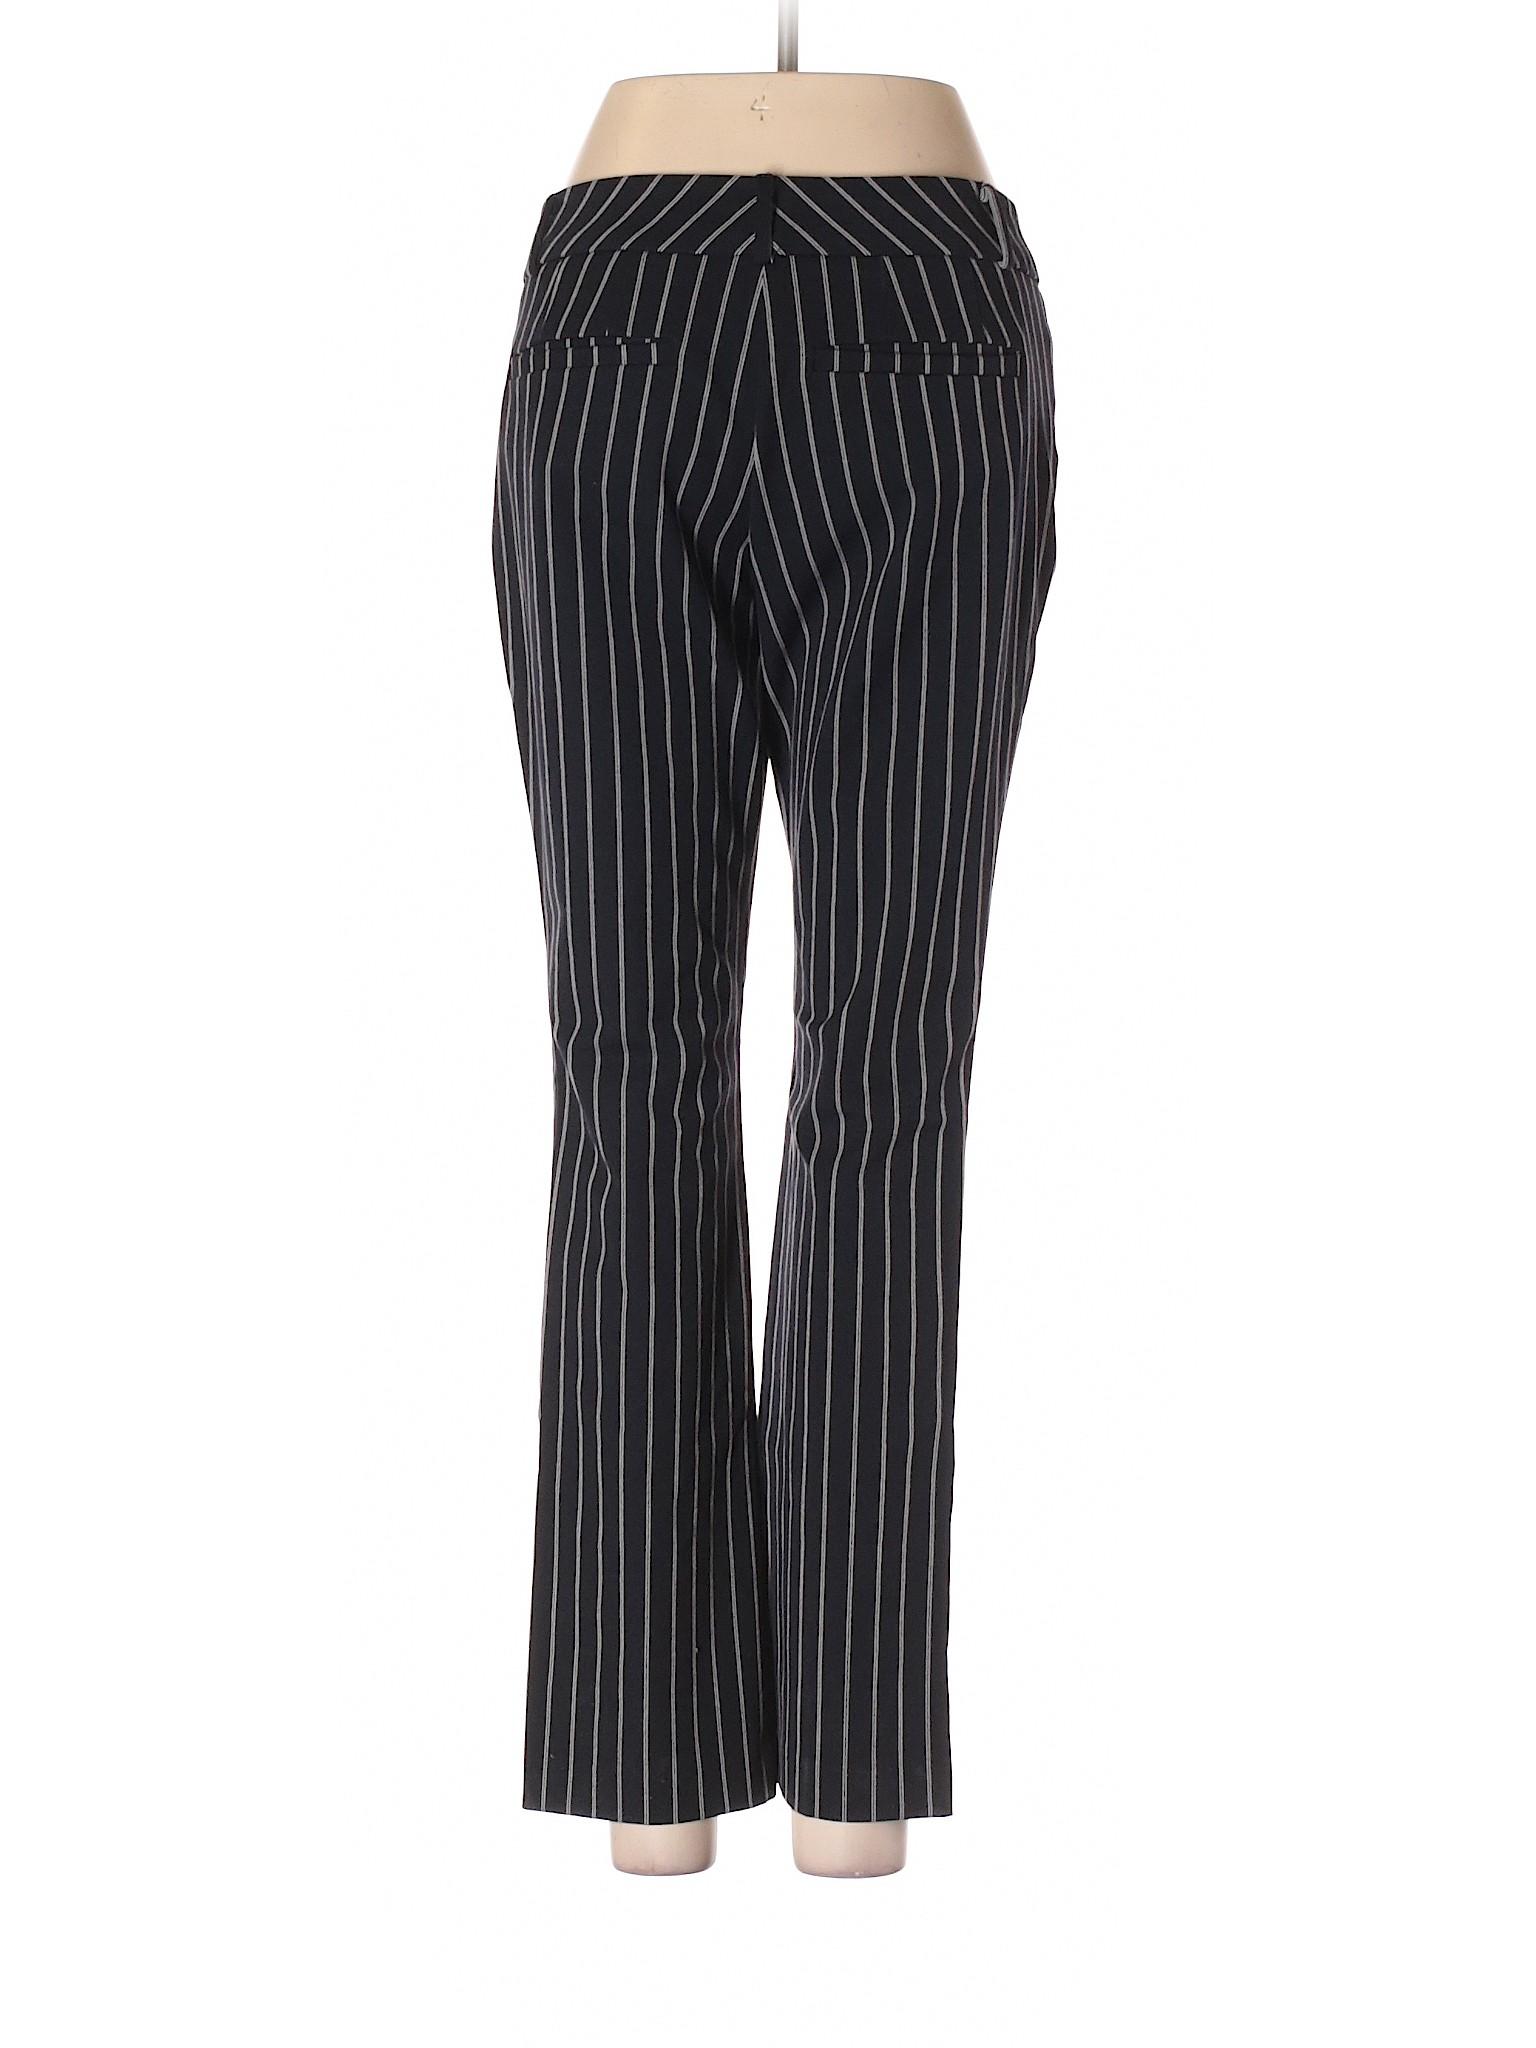 Company Boutique Pants Design Studio Avenue winter 7th Dress amp; New York F1q8F